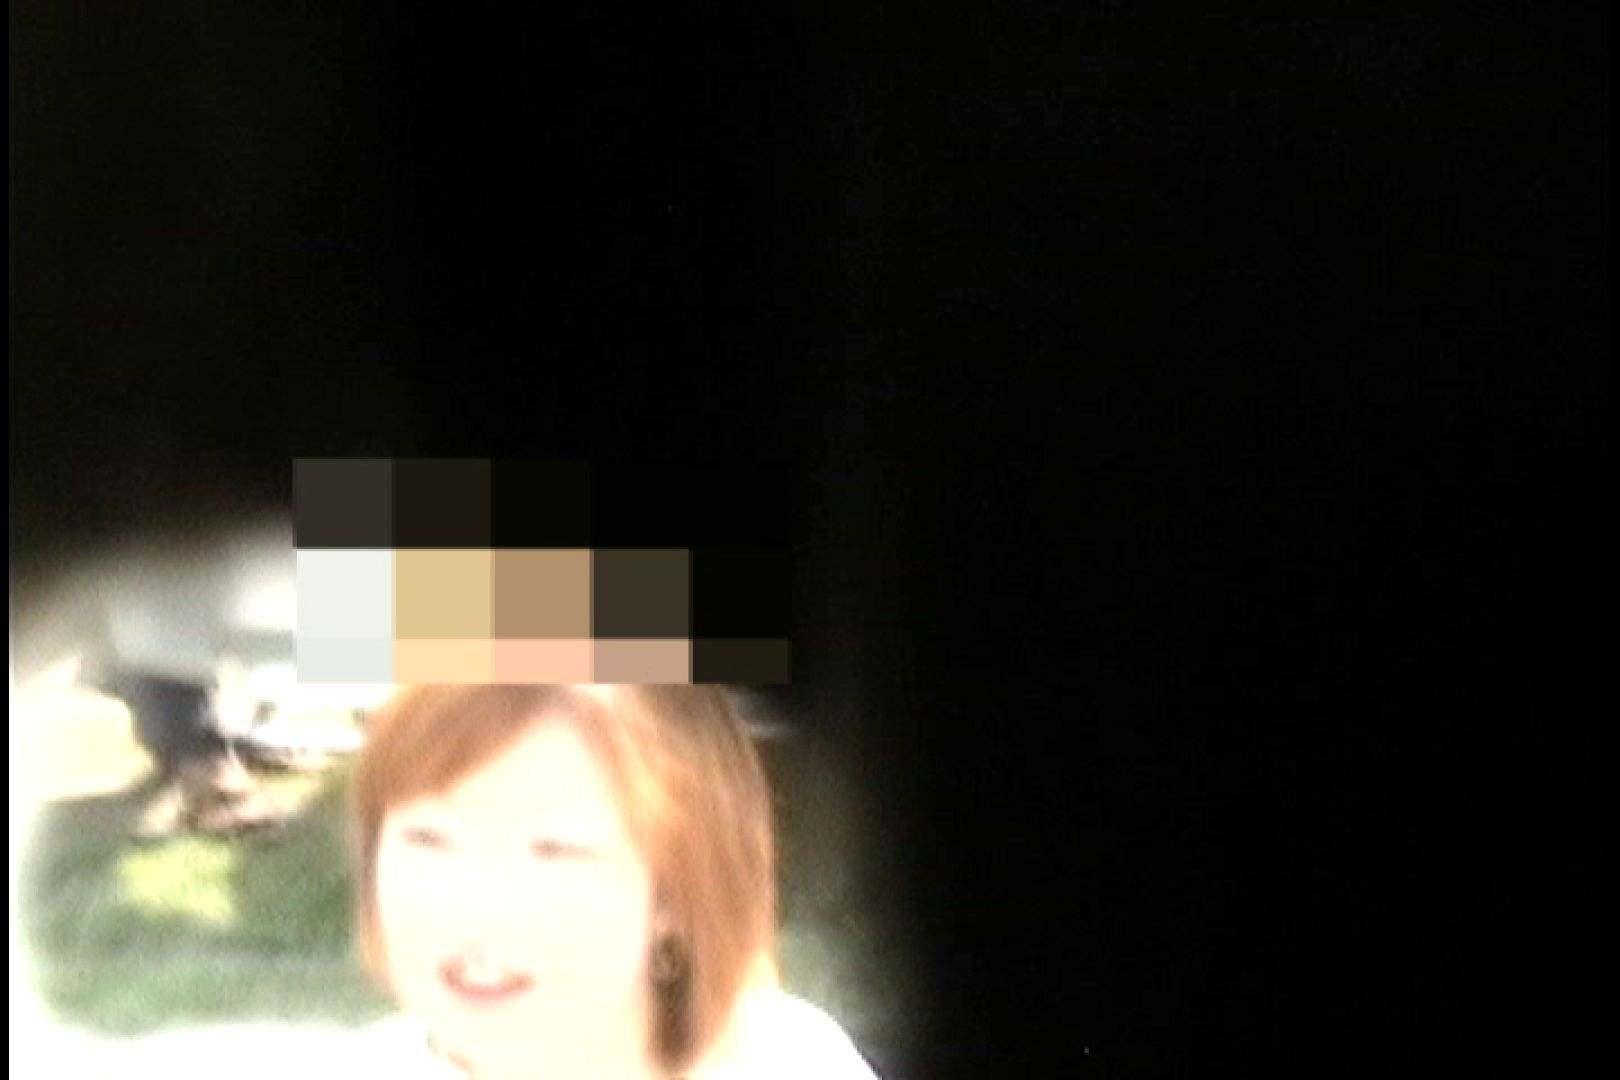 No.41 陰茎から滴り落ちる水滴 美乳 おまんこ無修正動画無料 108枚 3